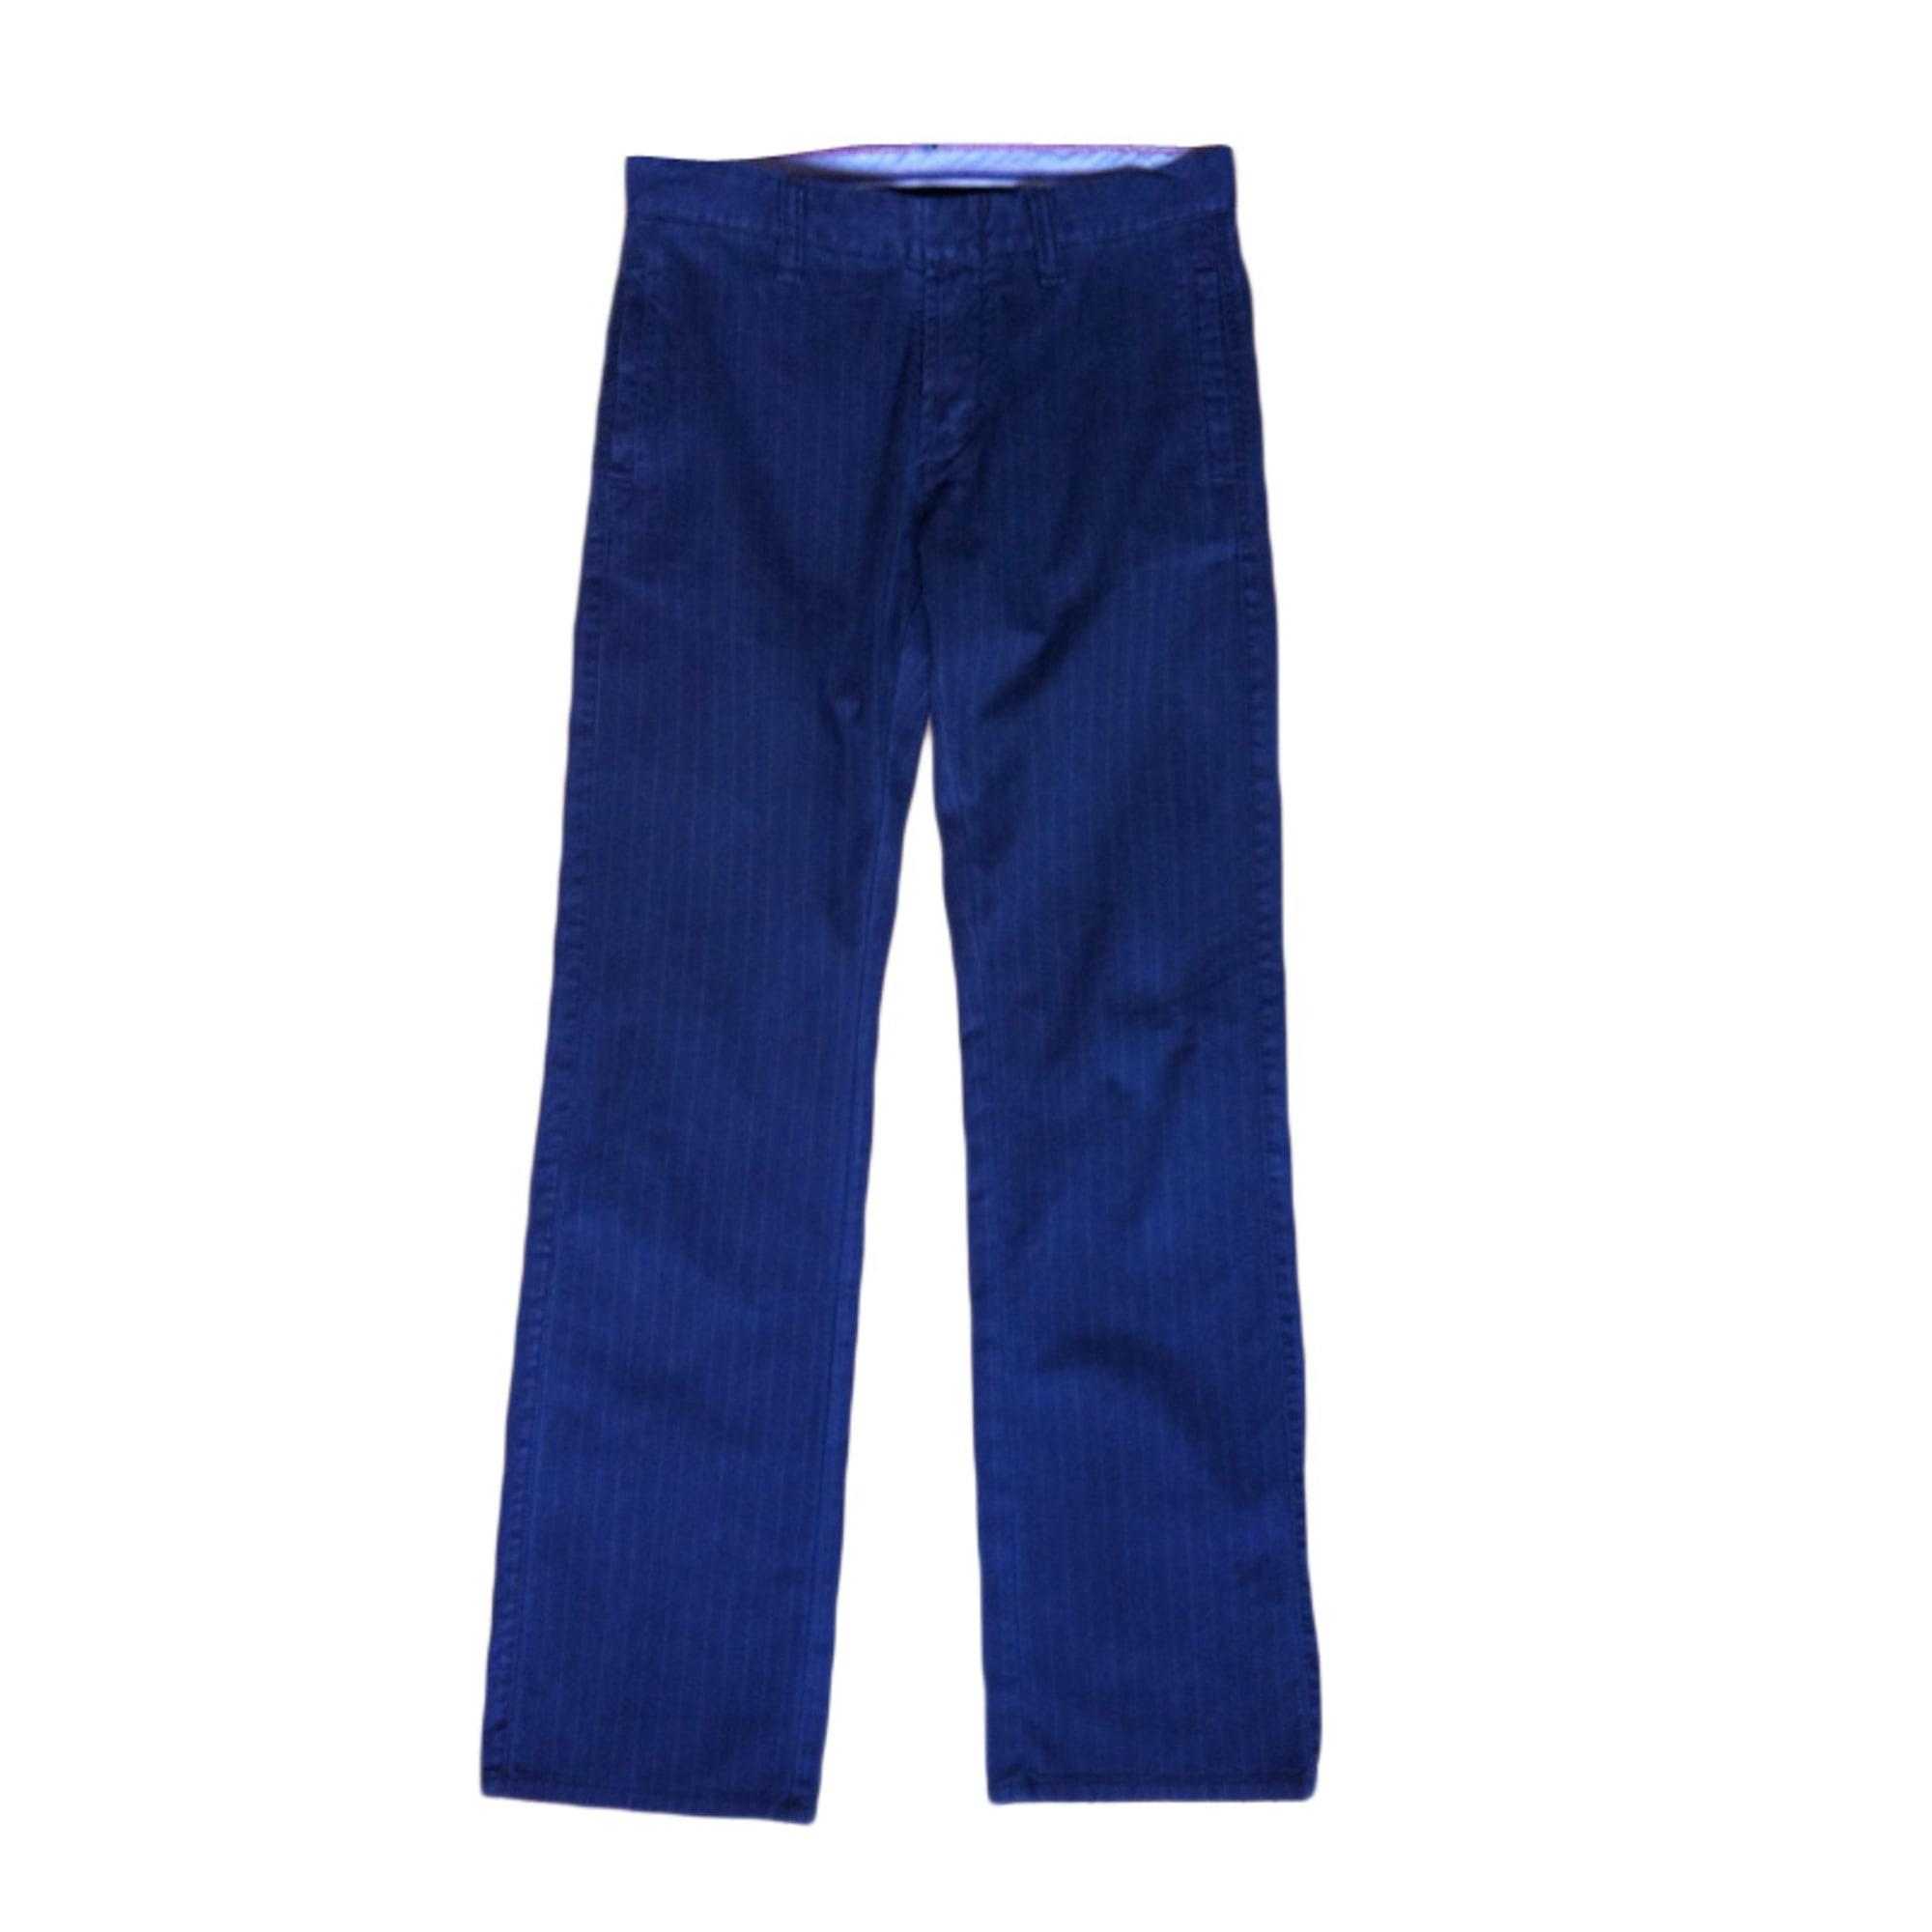 Pantalon droit MEXX Bleu, bleu marine, bleu turquoise